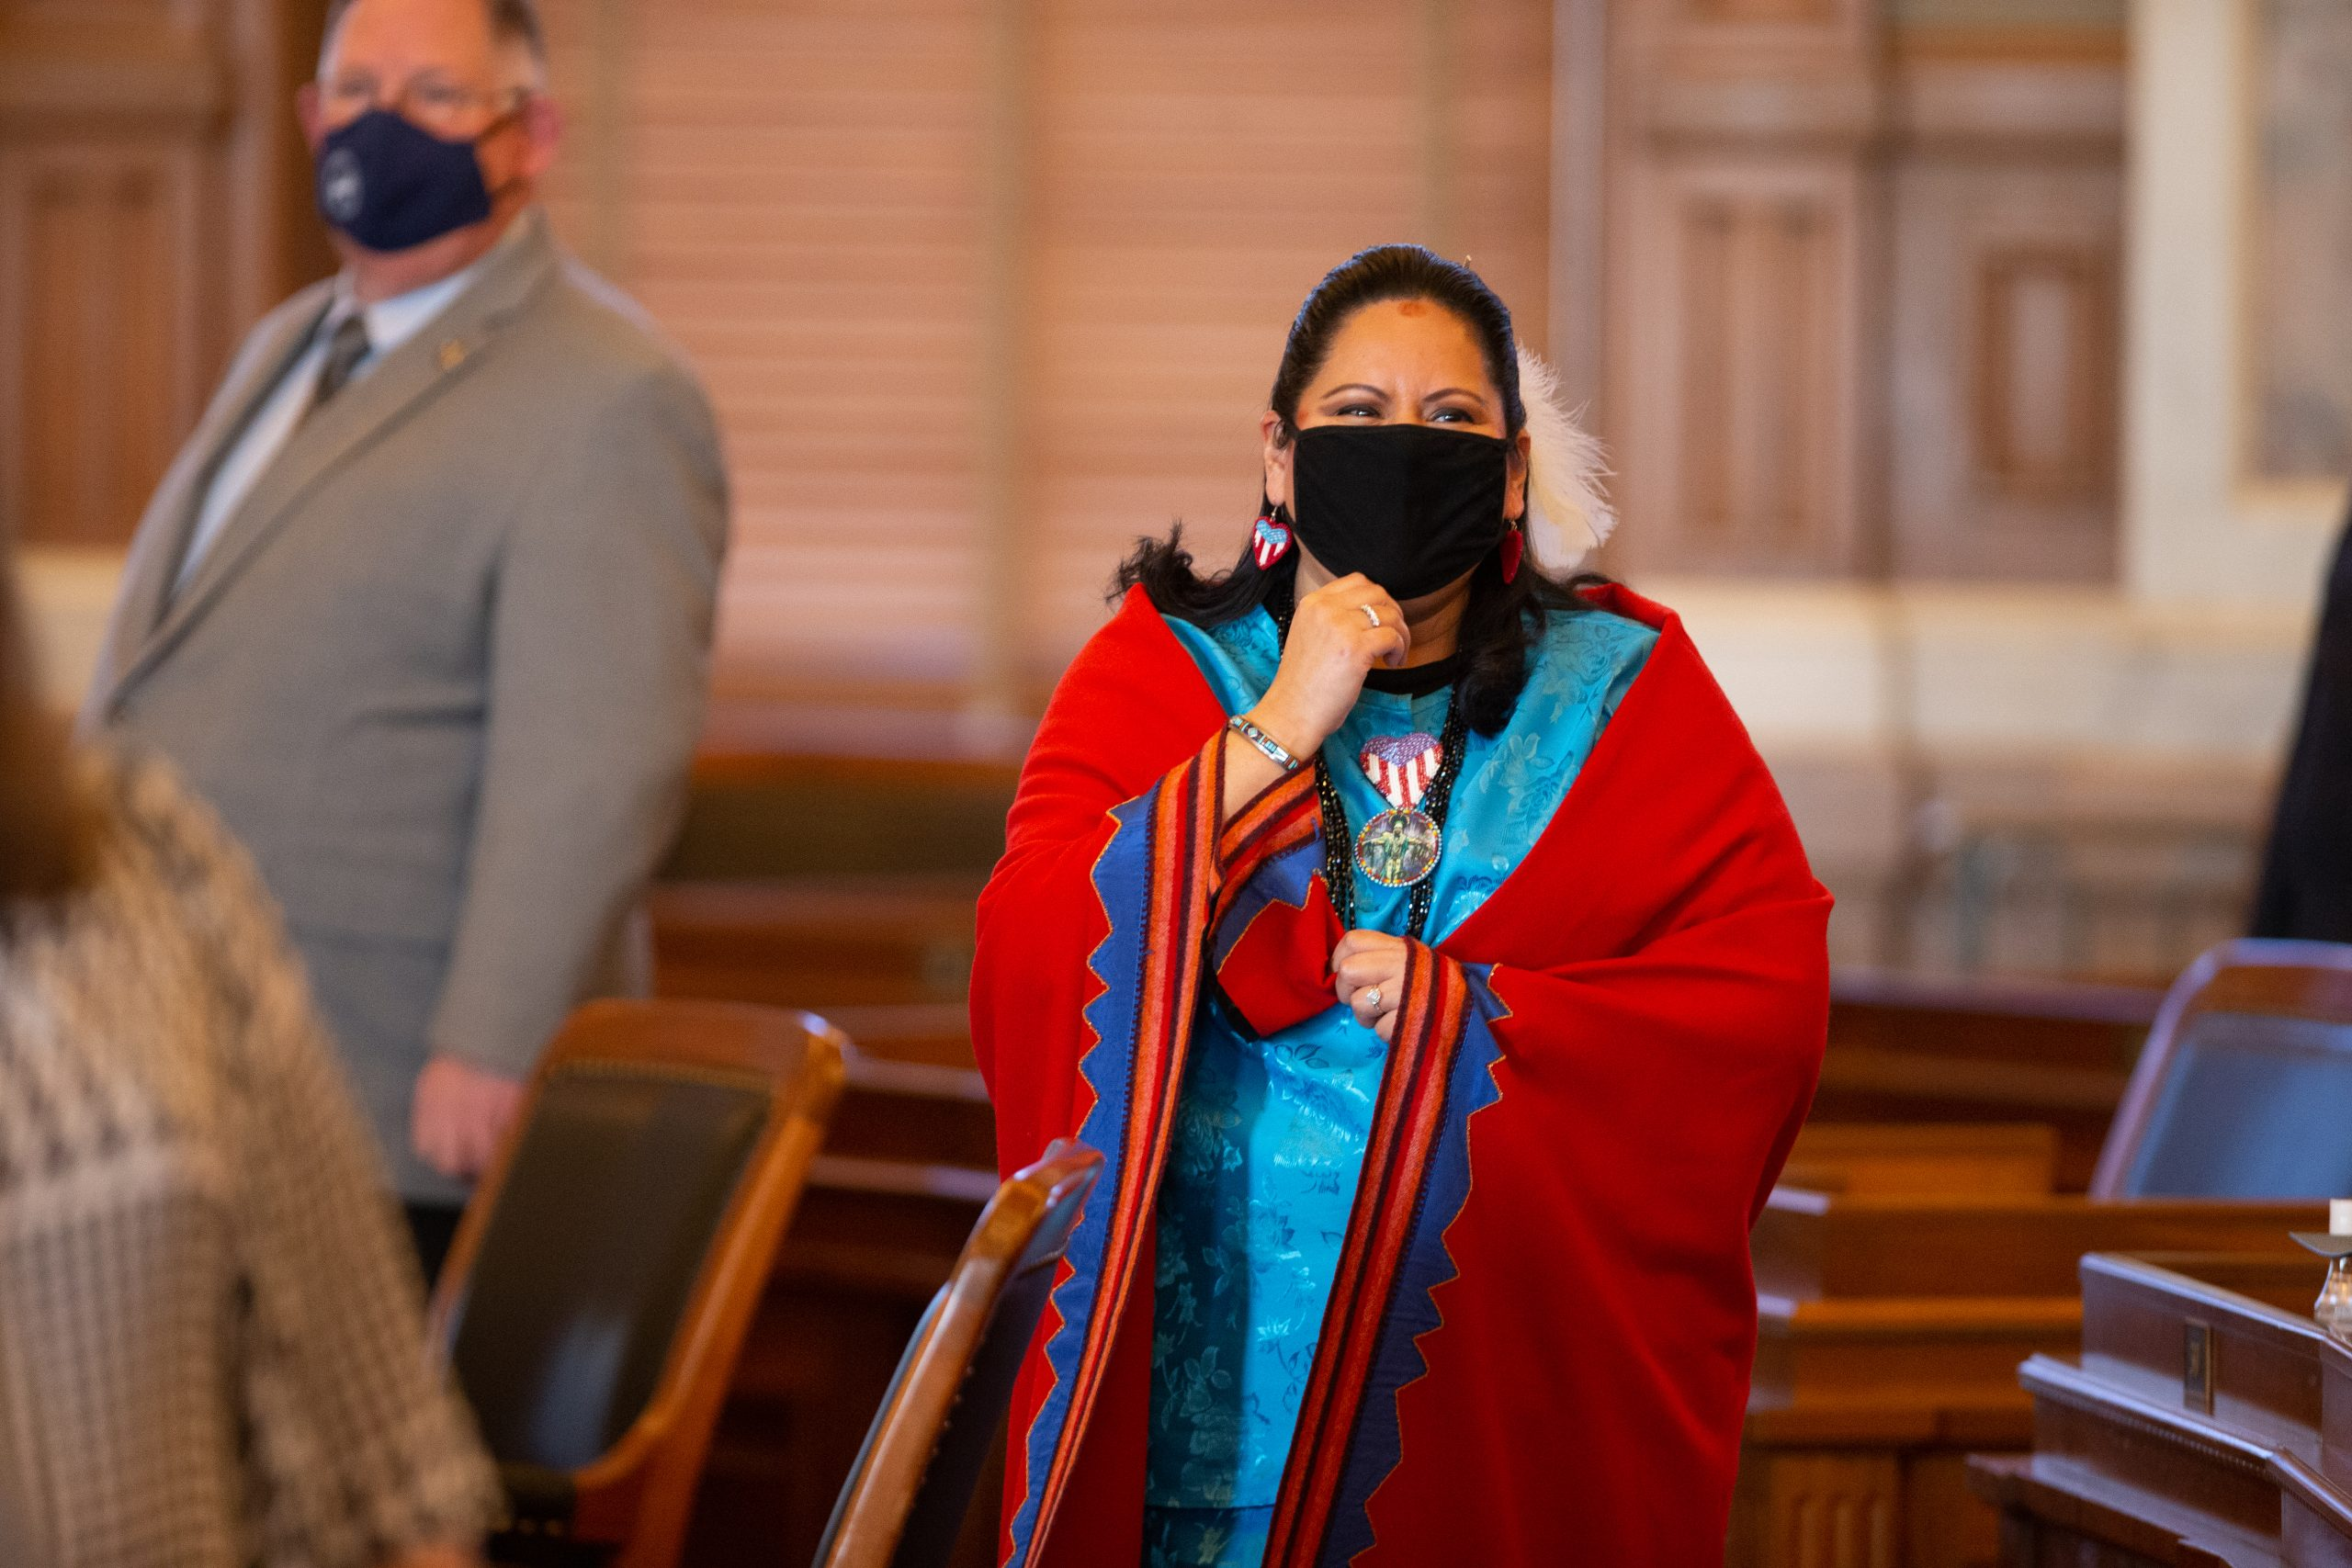 Legislators hopeful Kansas will take meaningful step to address missing Indigenous people